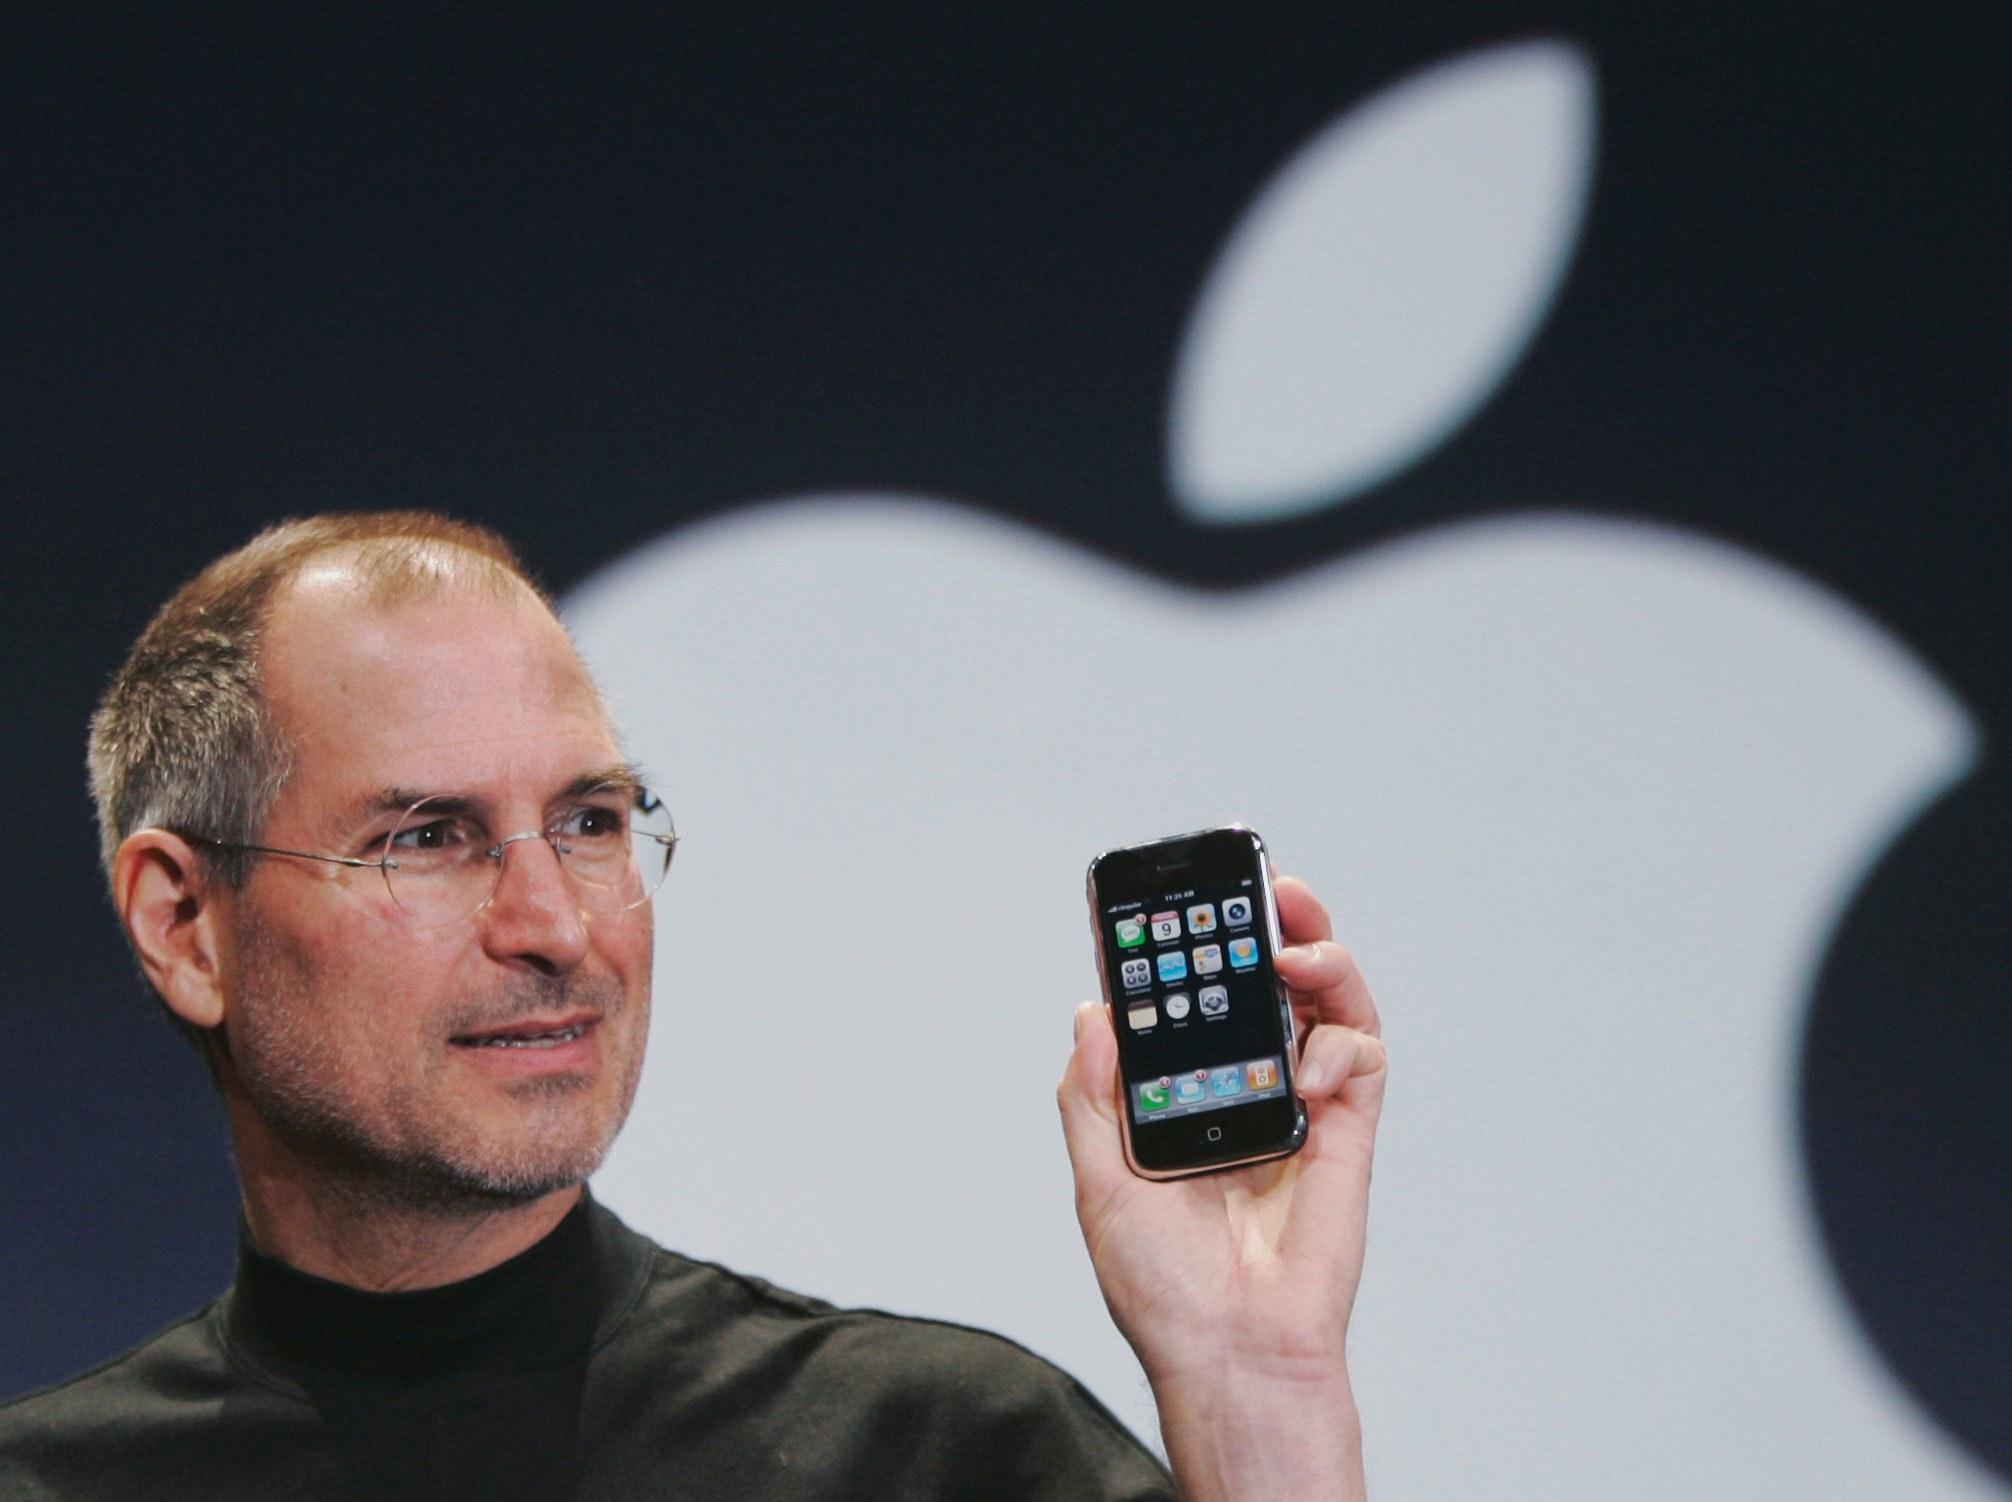 apple-steve-jobs-iphone-AP_070109066608.jpg